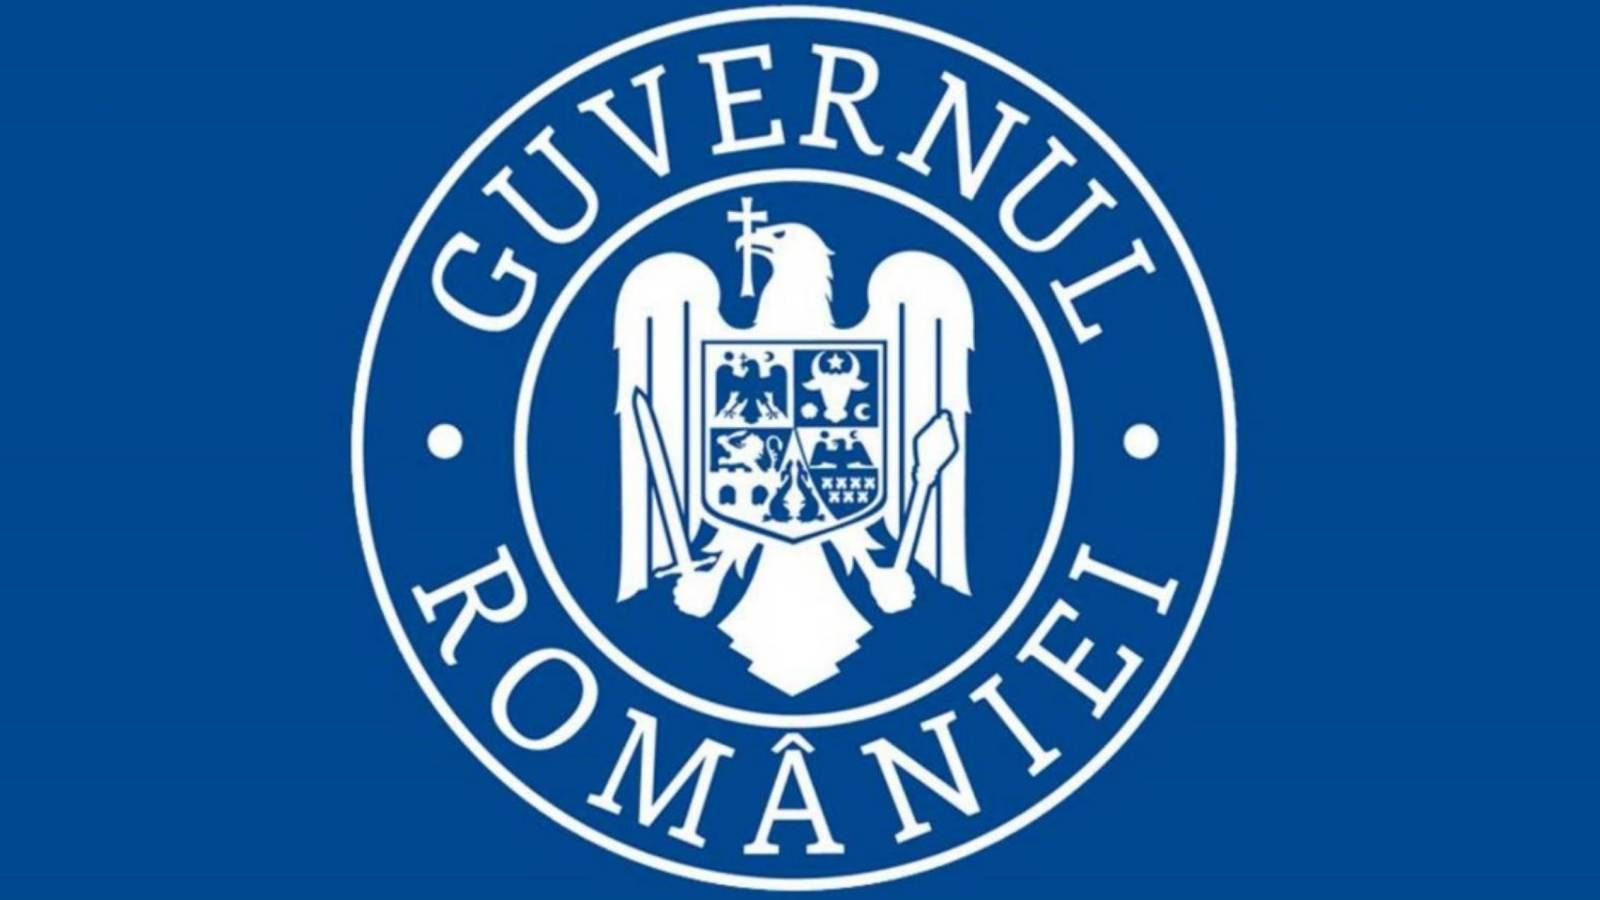 Guvernul Romaniei Retele 5G Producatori Avizati csat